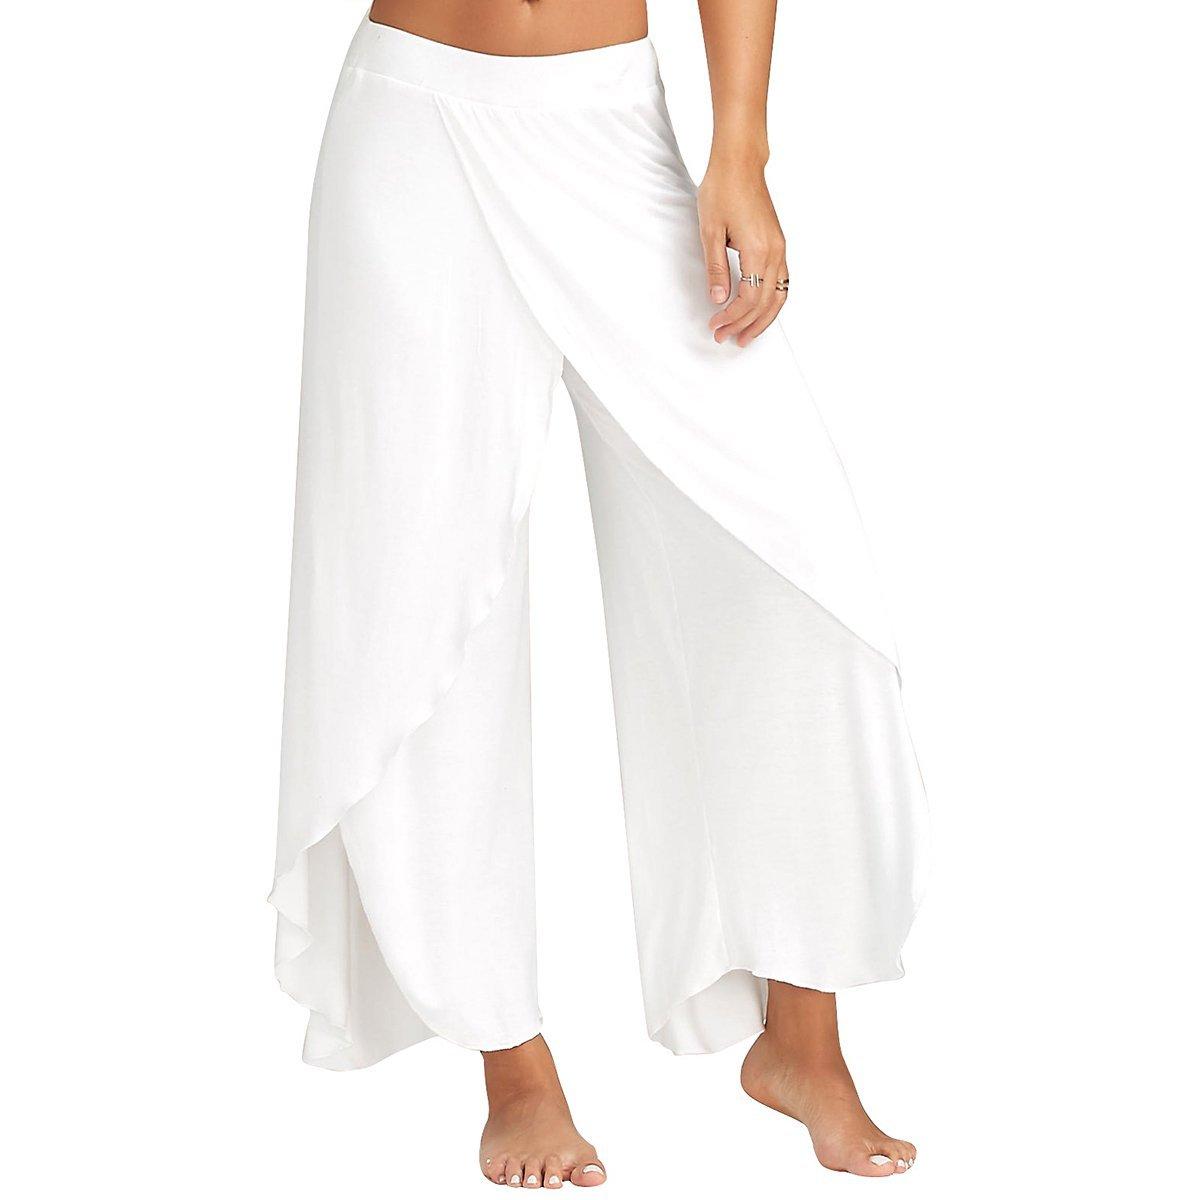 9a01d5adb1d Get Quotations · Zcargel Women s High Waist Slit Wide Leg Yoga Pants  Layered Flowy Cropped Palazzo Pants